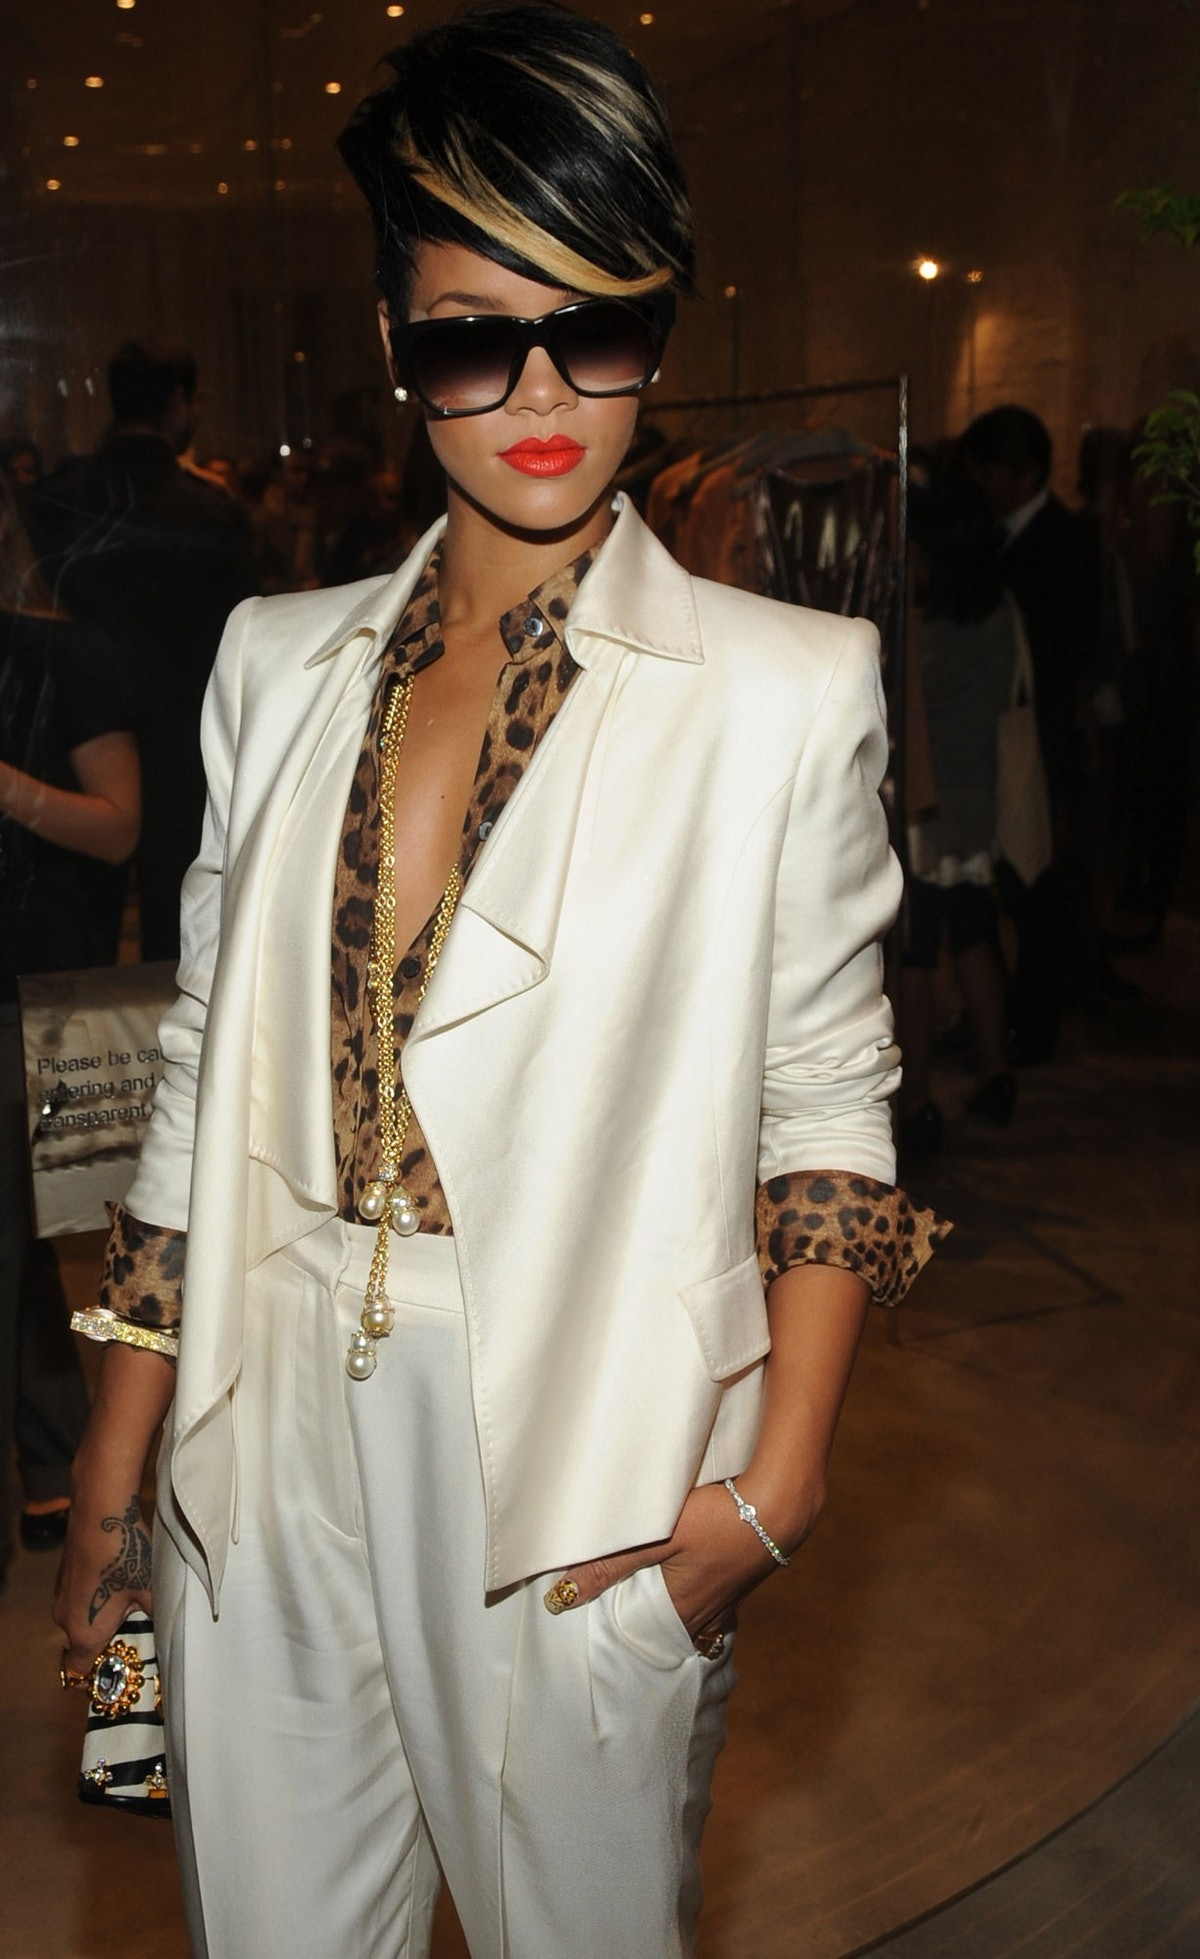 Rihanna. Photo by WWD/Steve Eichner.